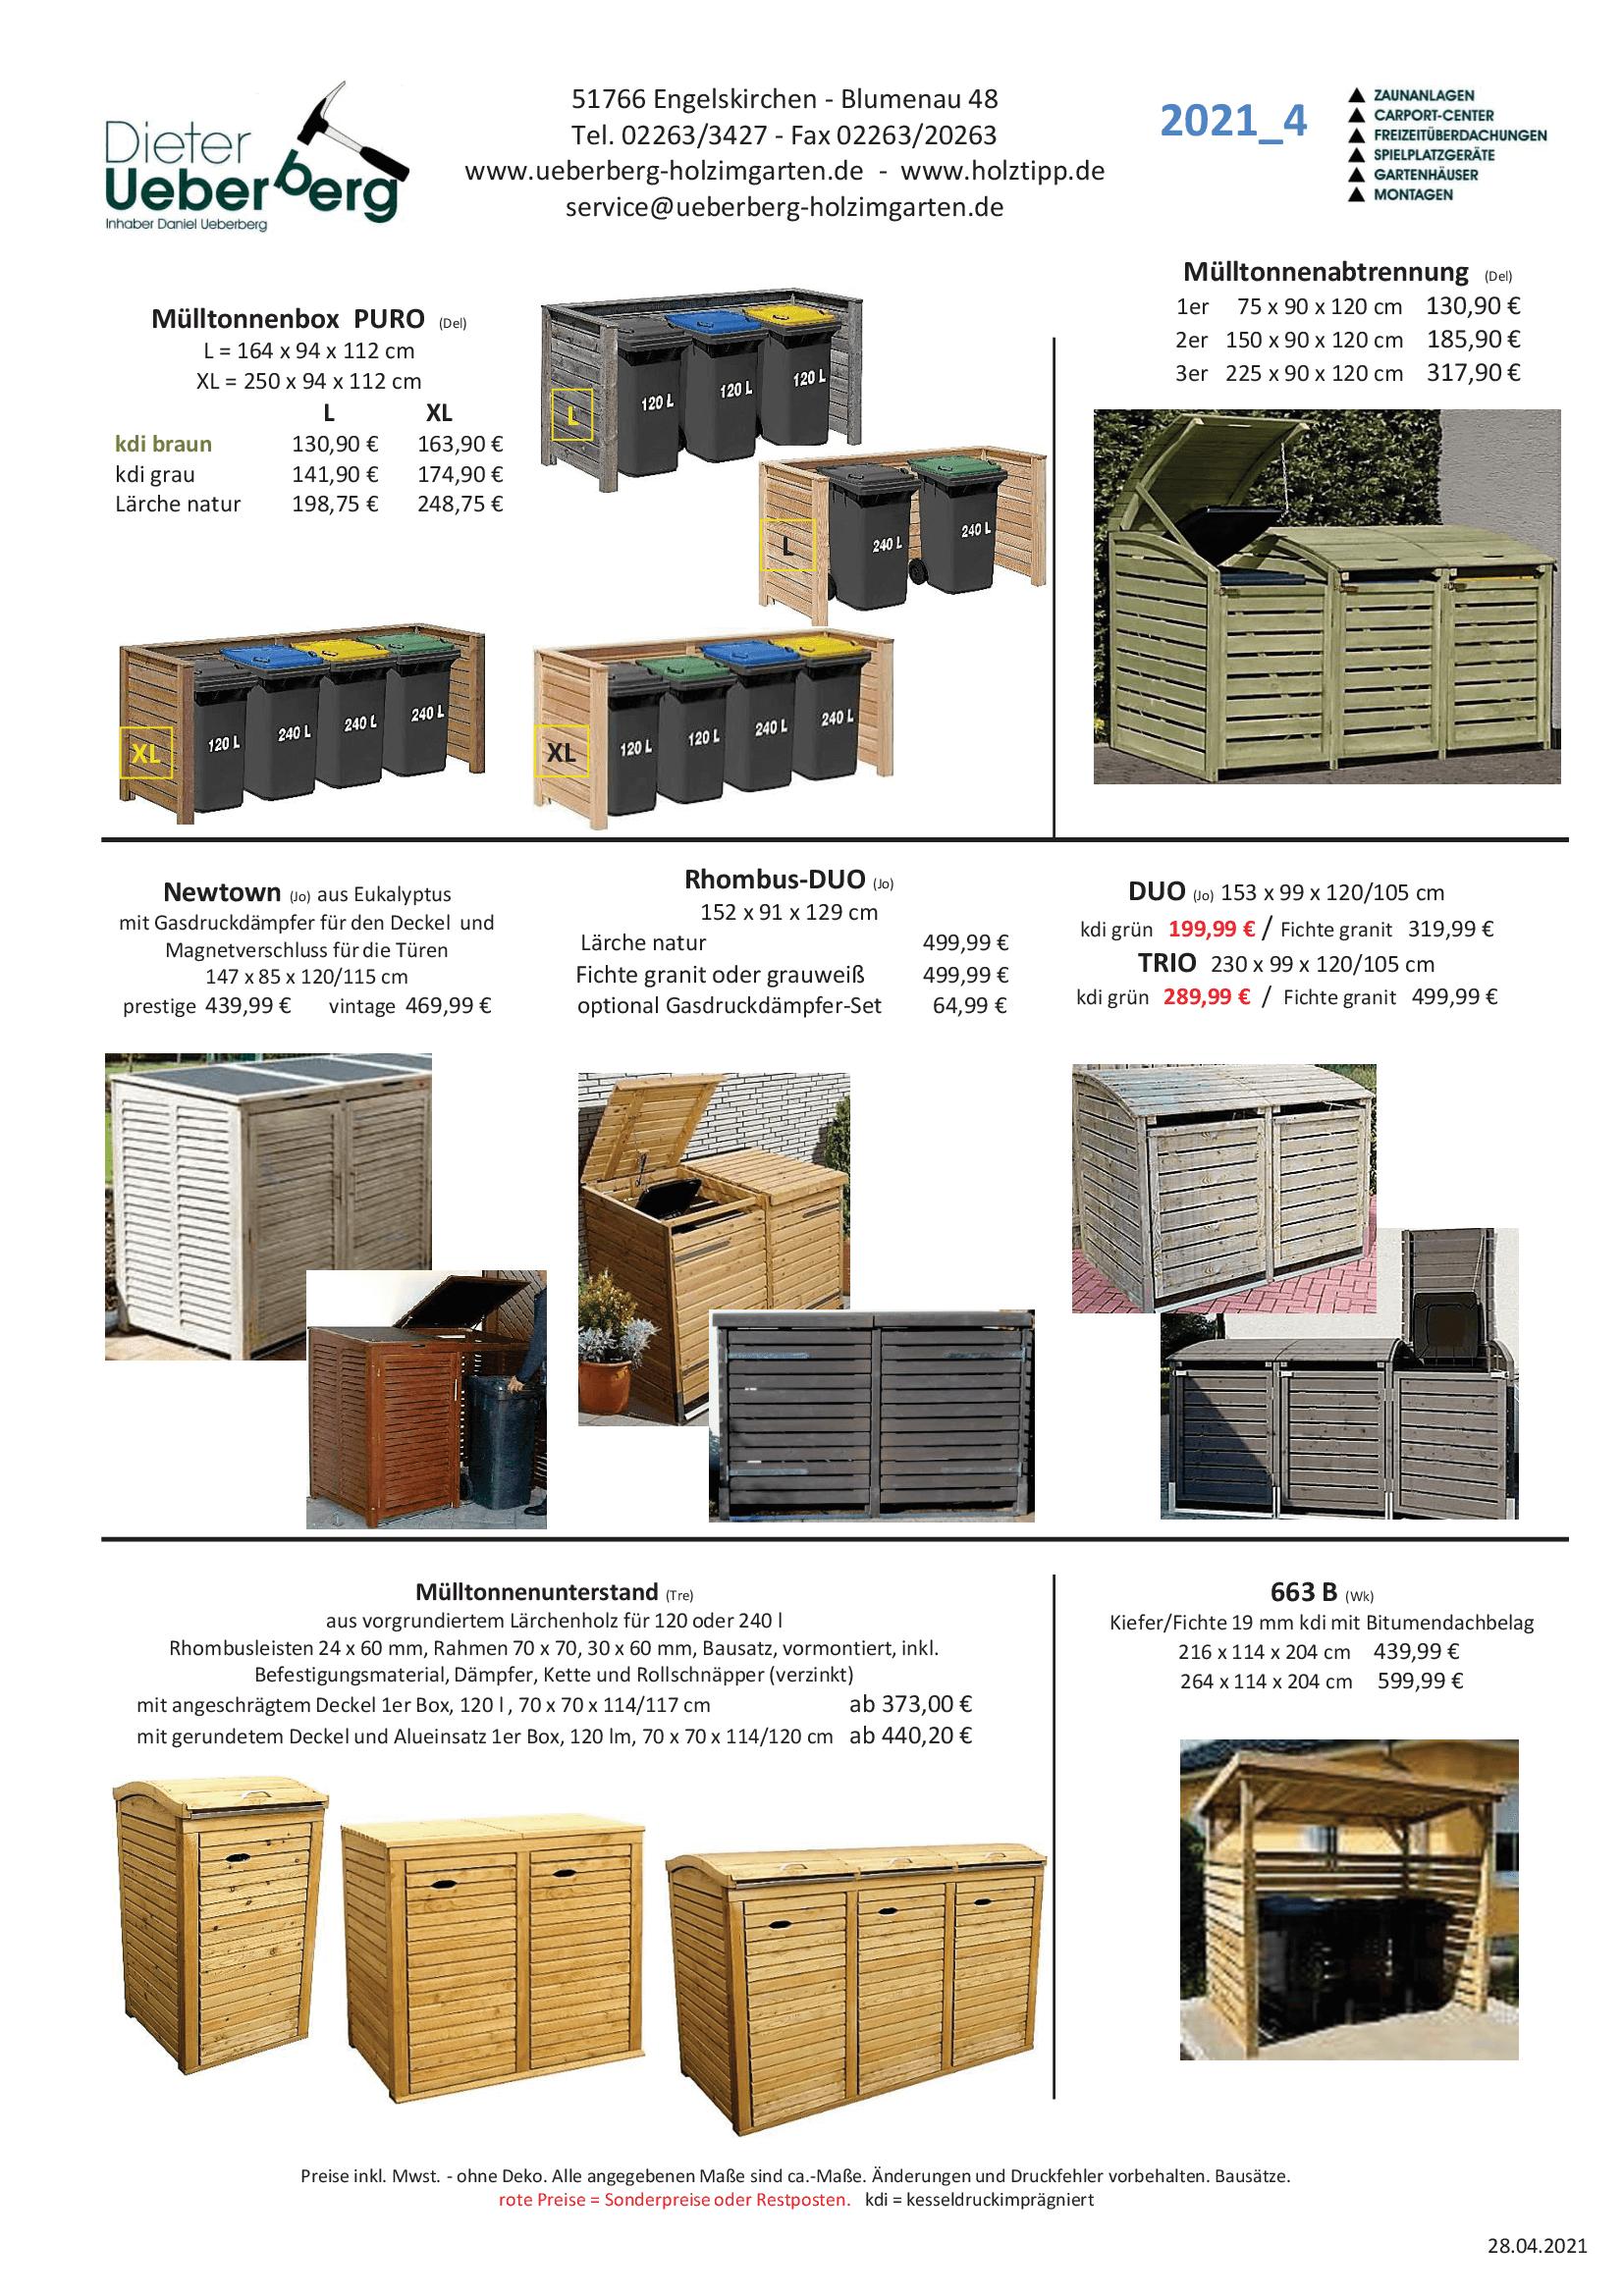 Müllboxen Ueberberg 2021_4